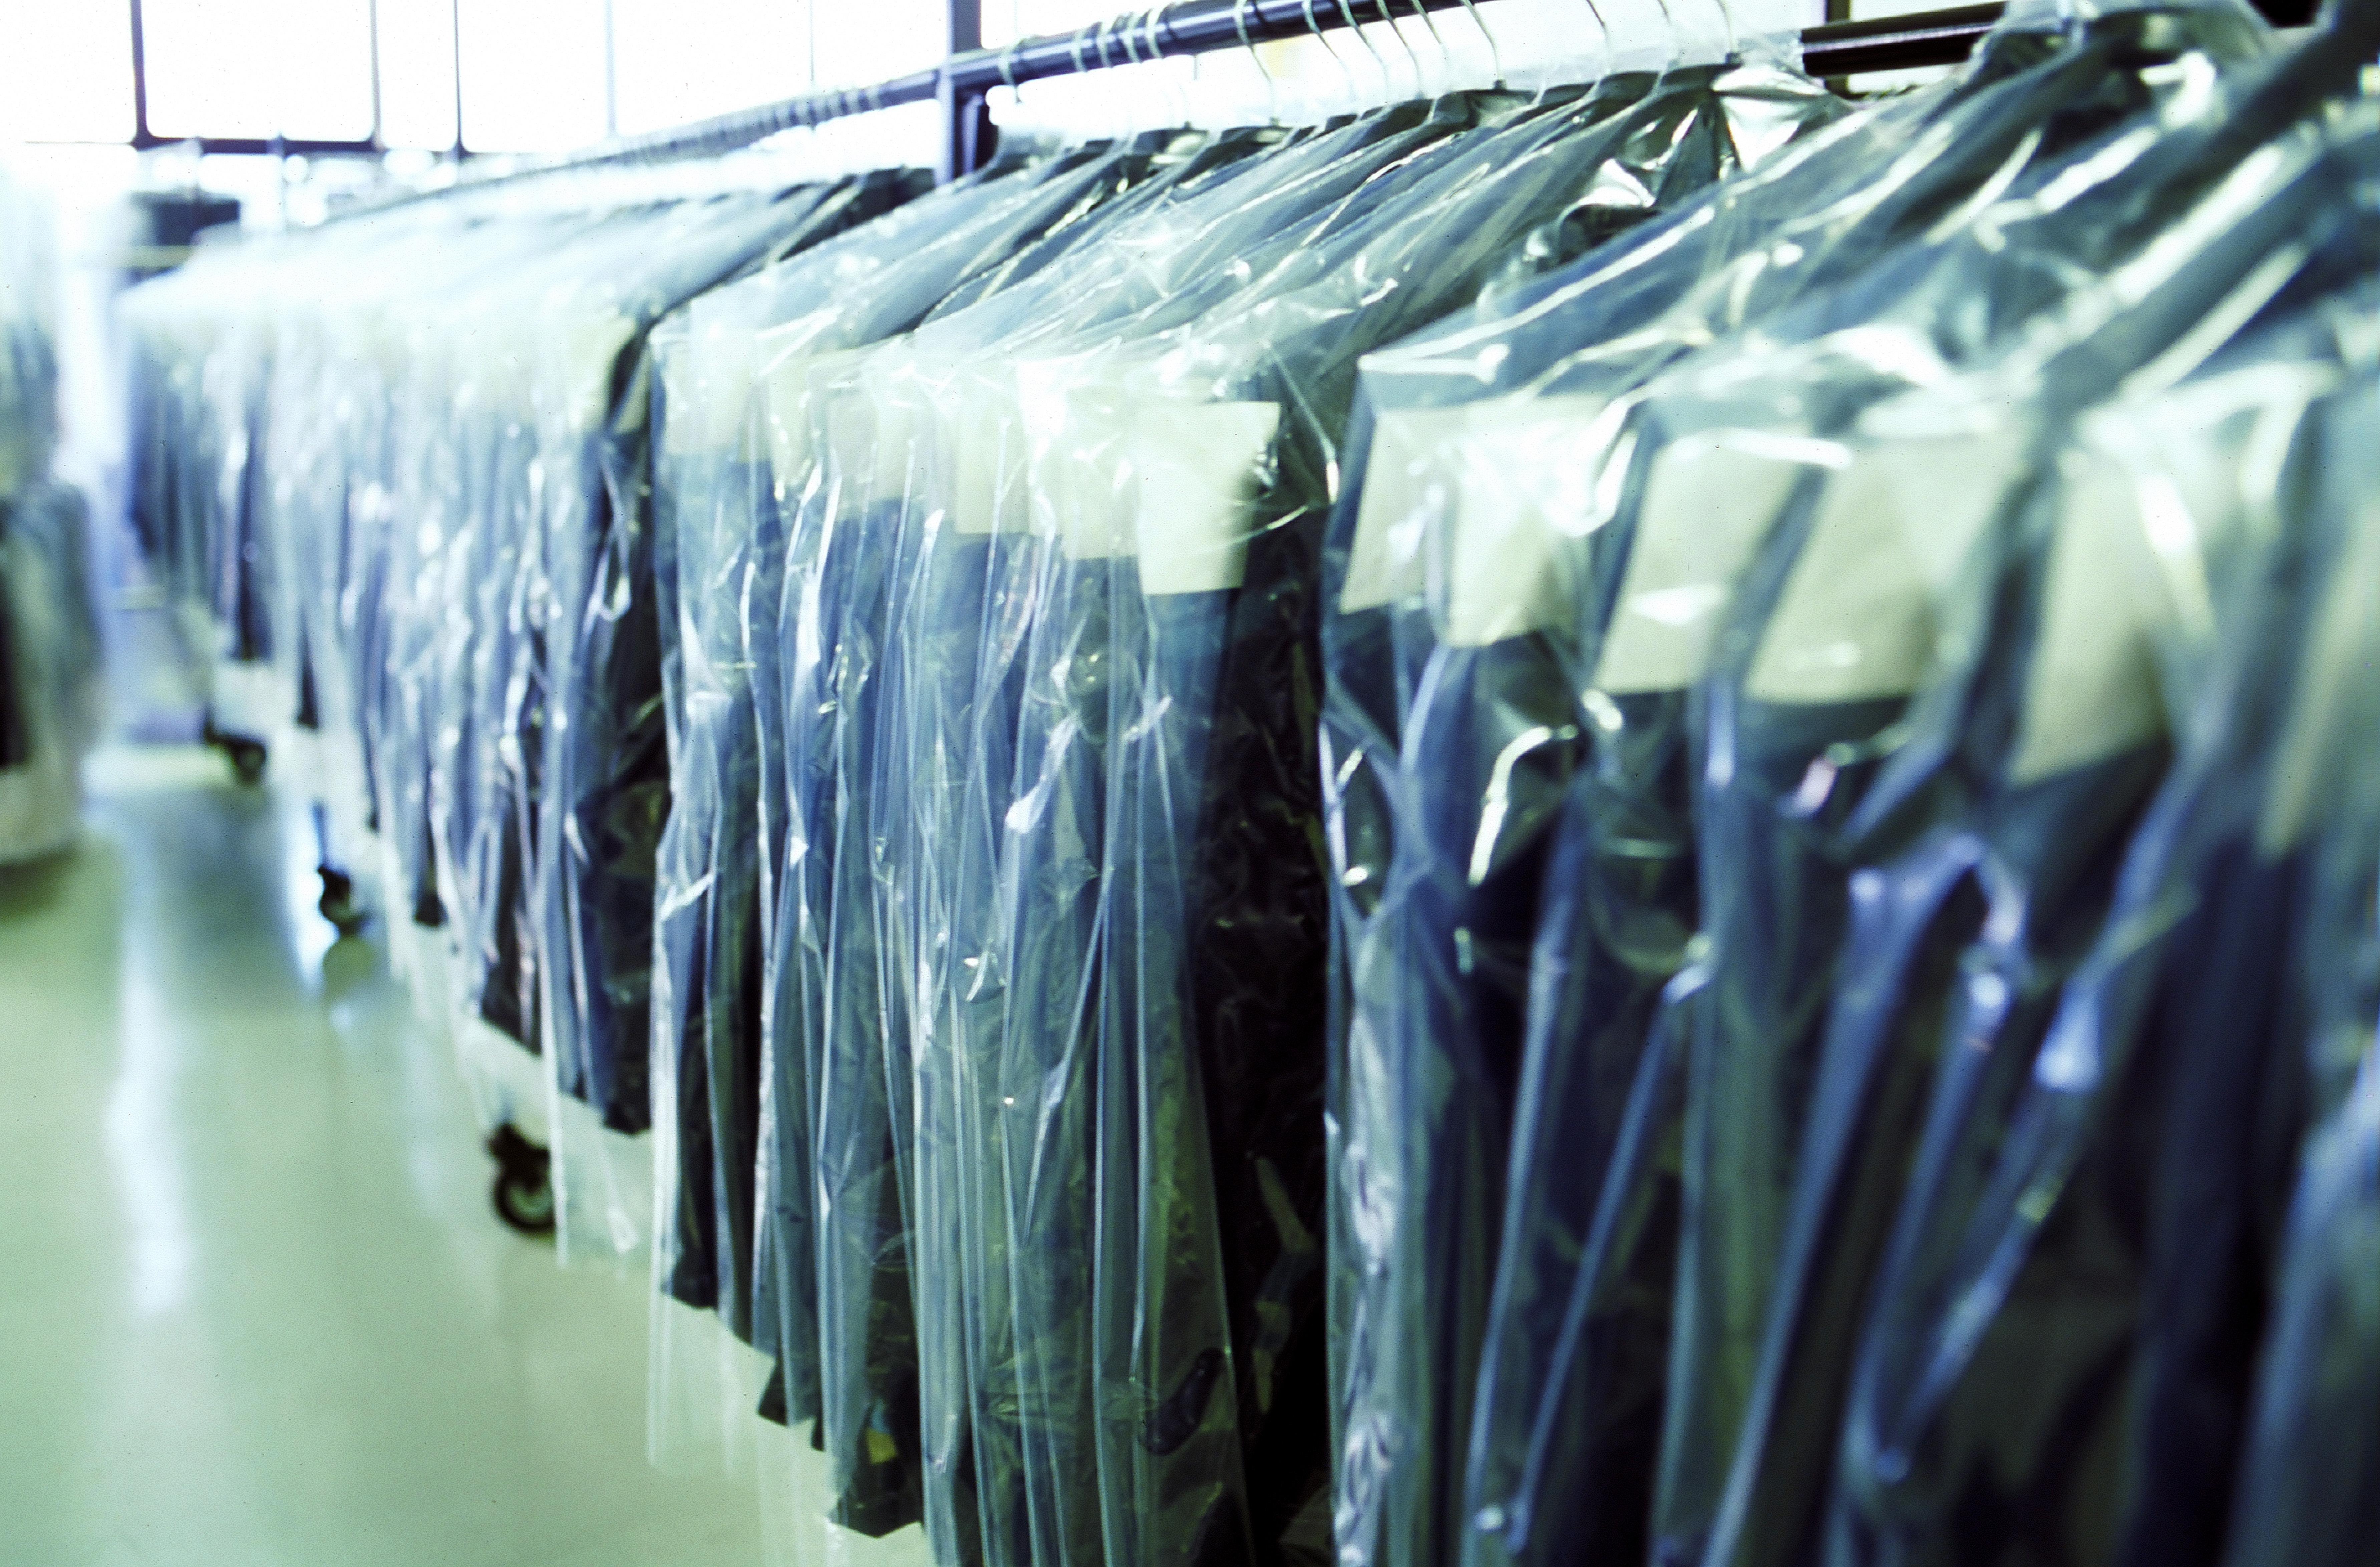 Racks of clothing